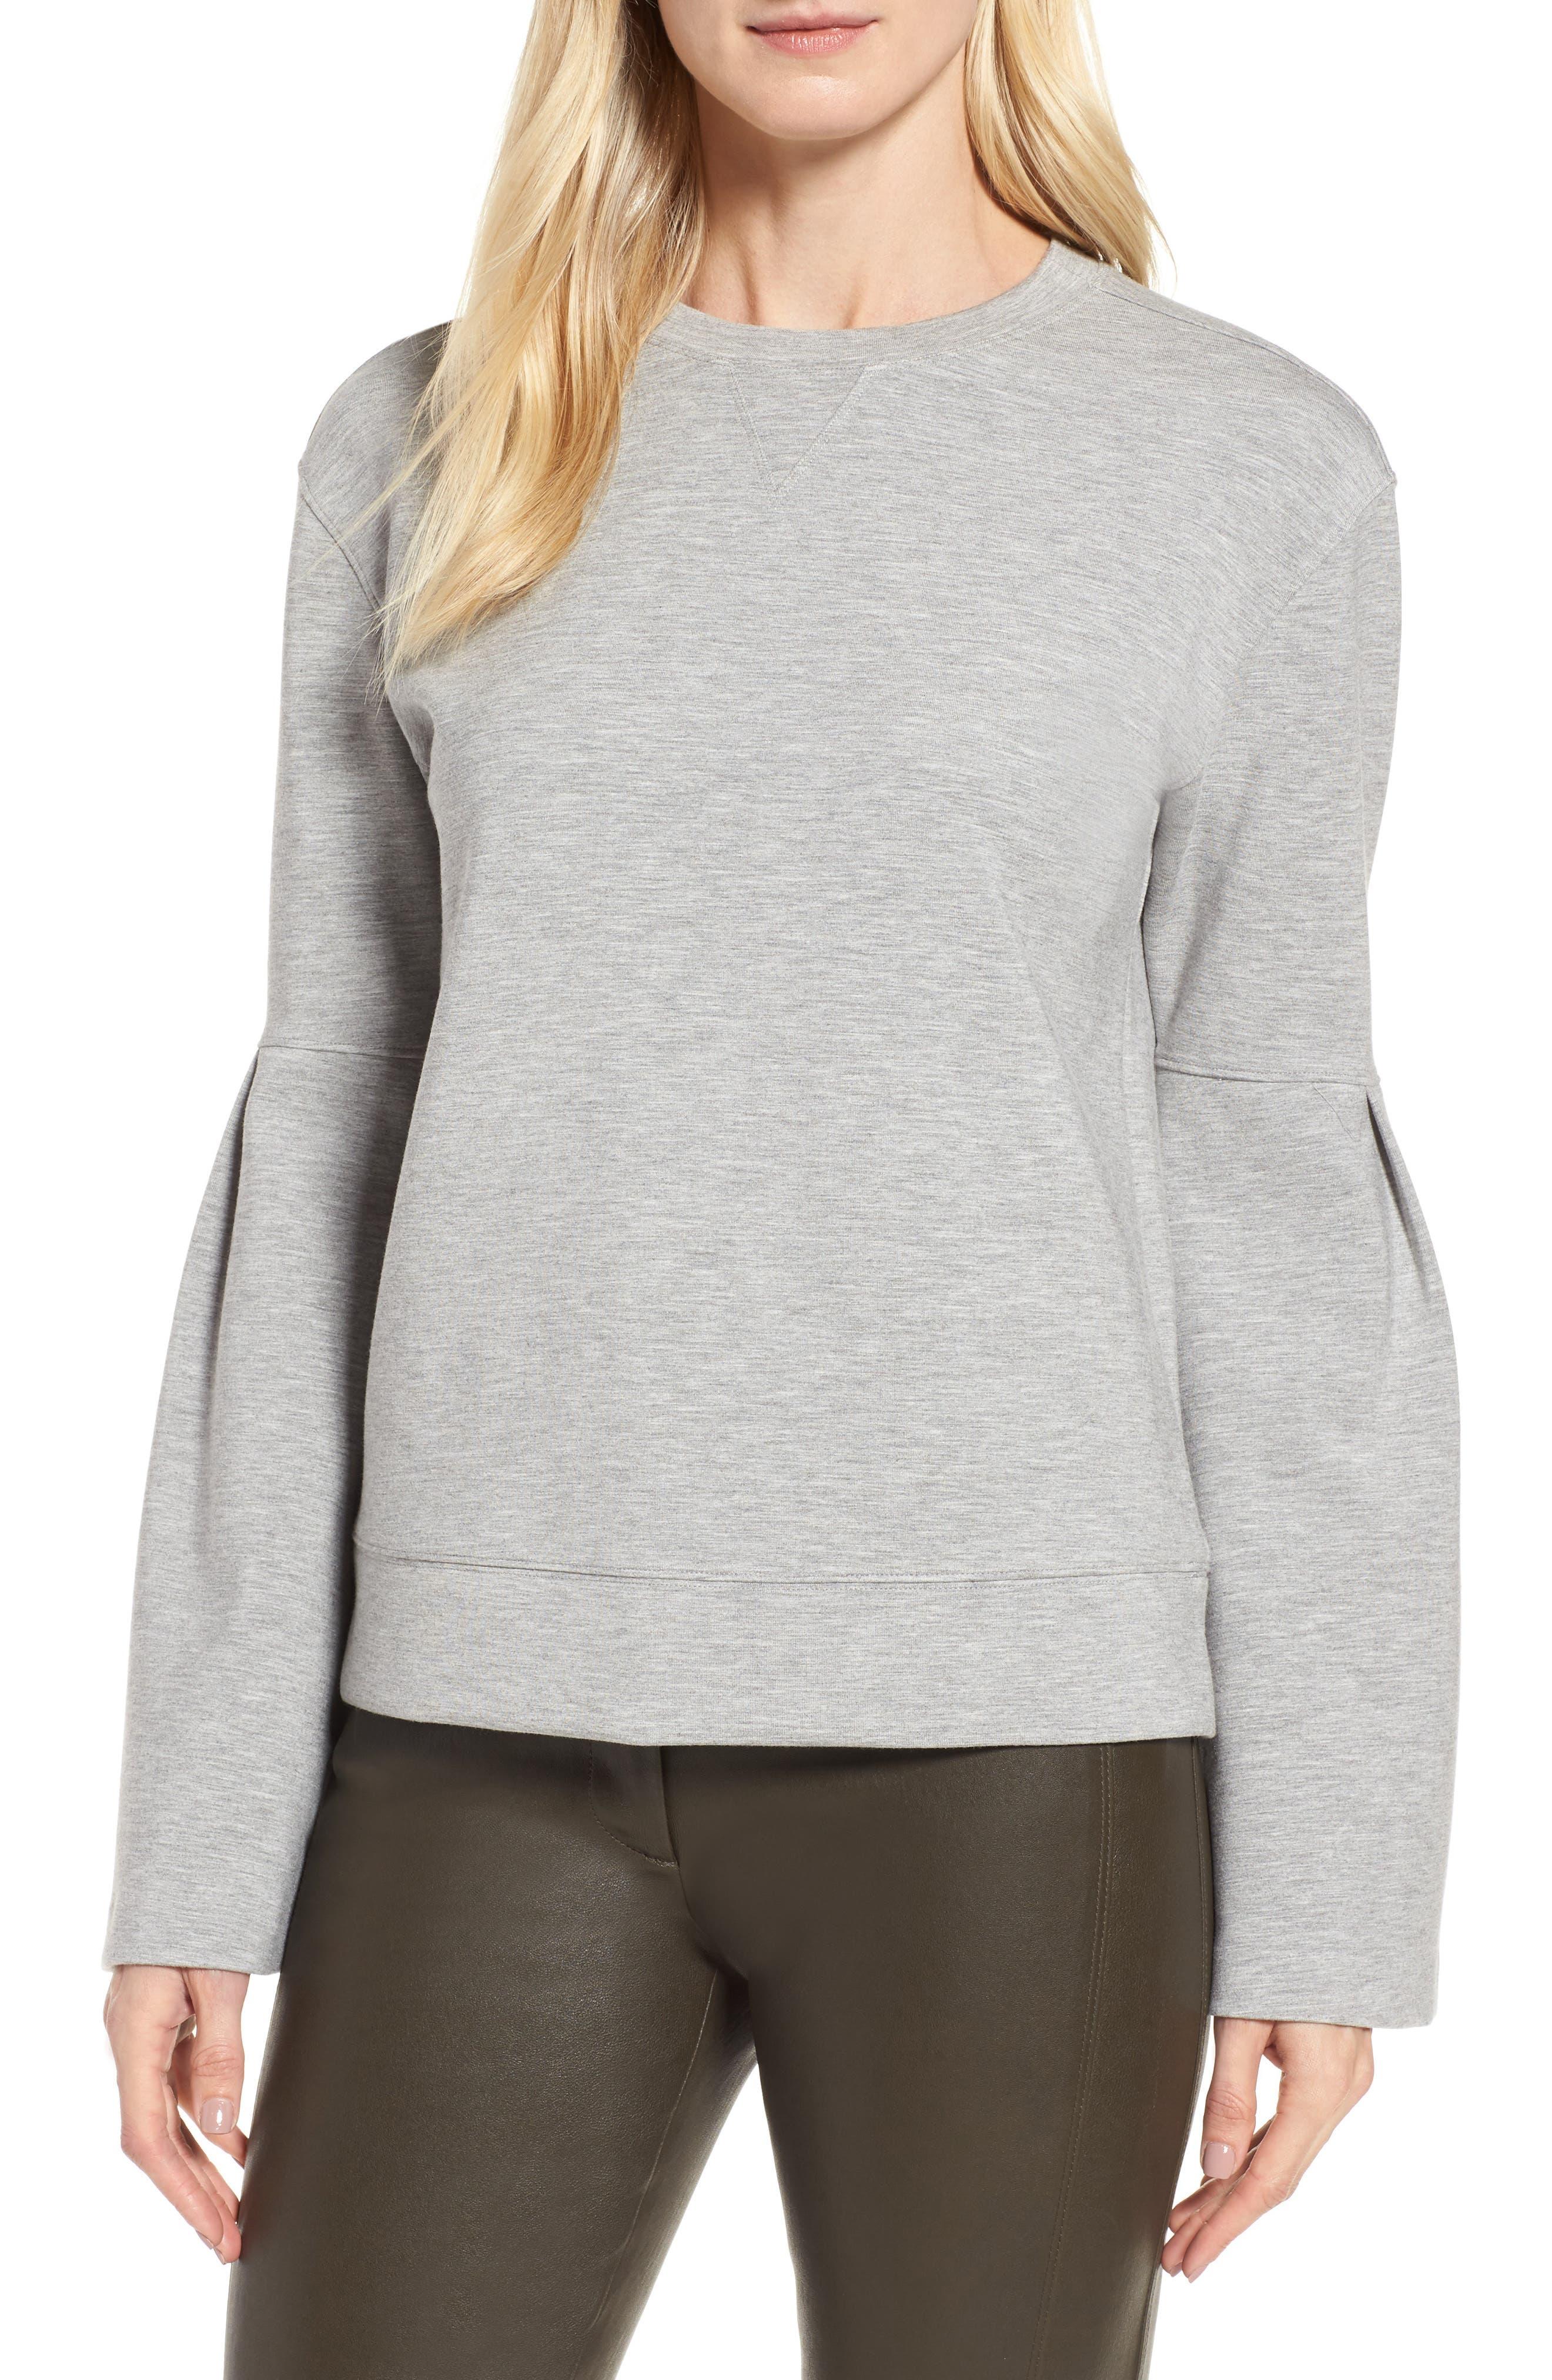 Nordstrom Signature Bell Sleeve Sweatshirt